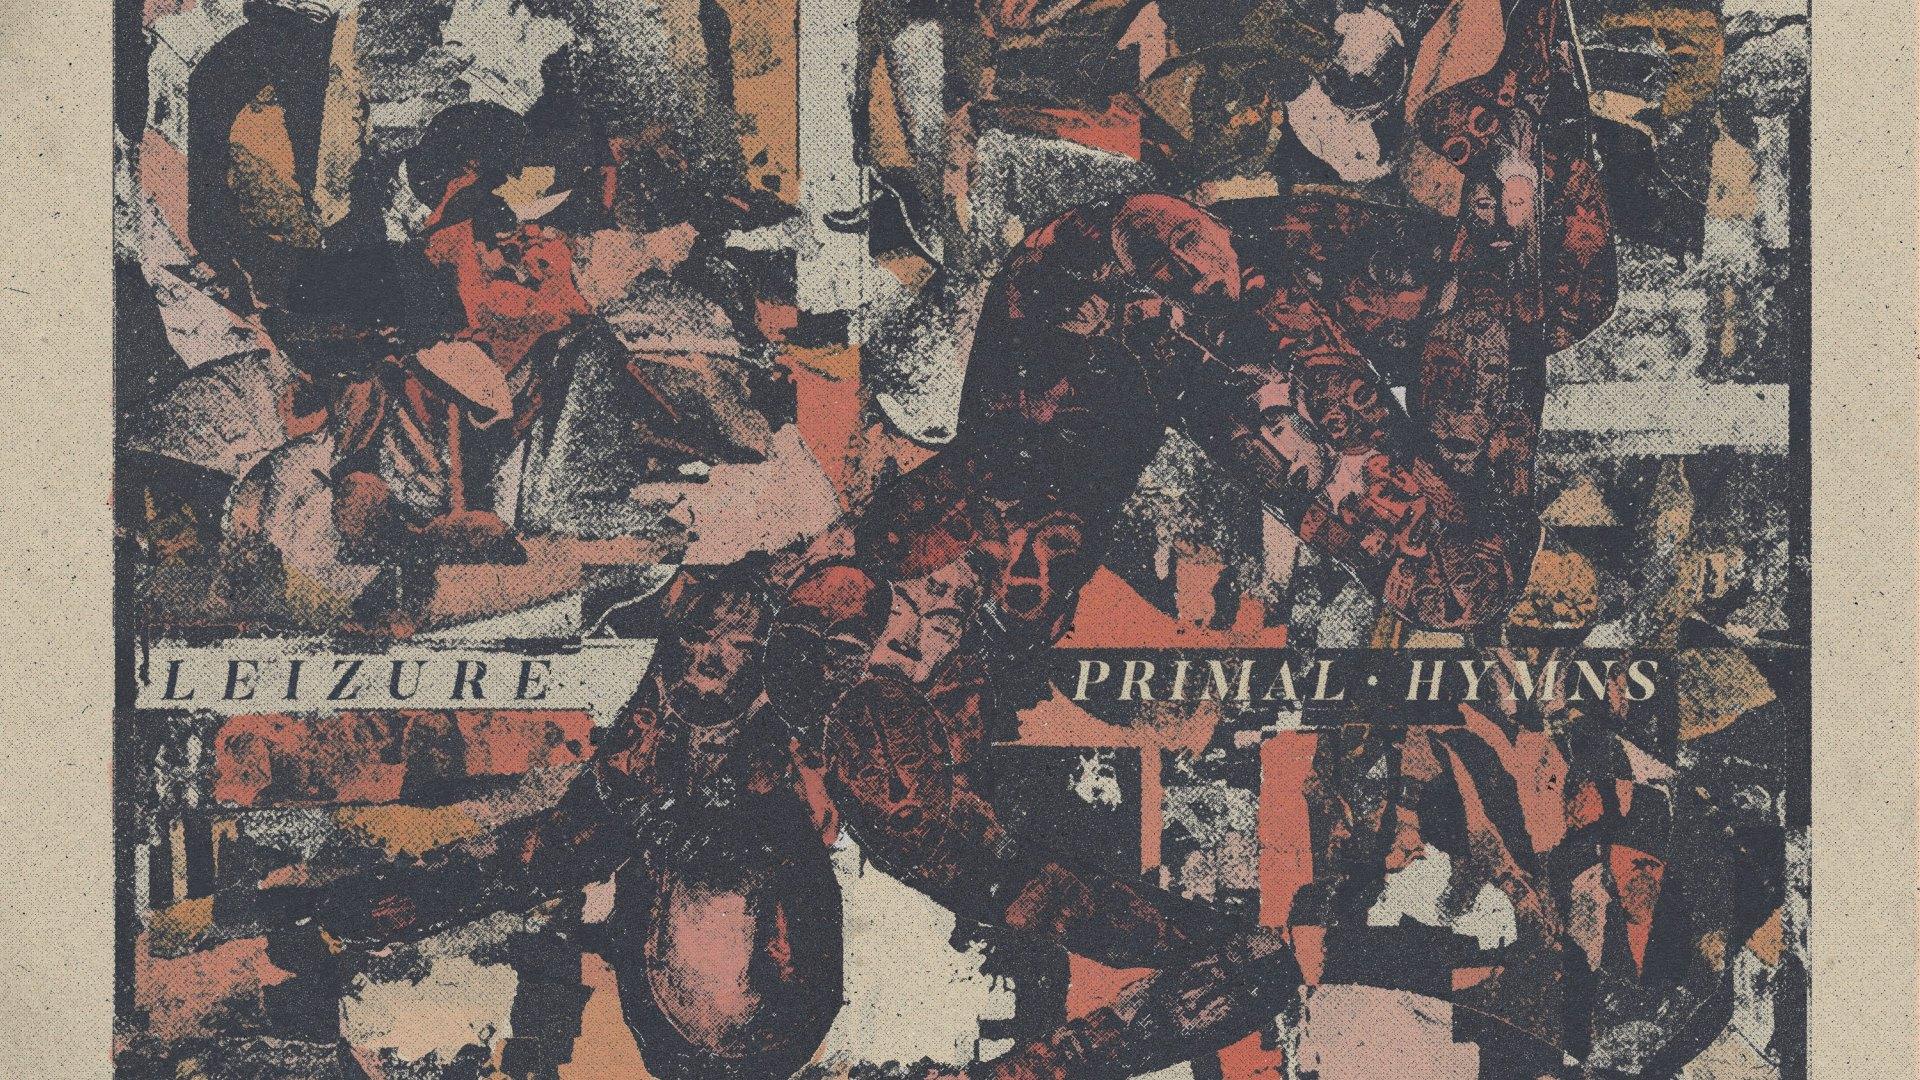 Leizure - Primal Hymns - Artwork